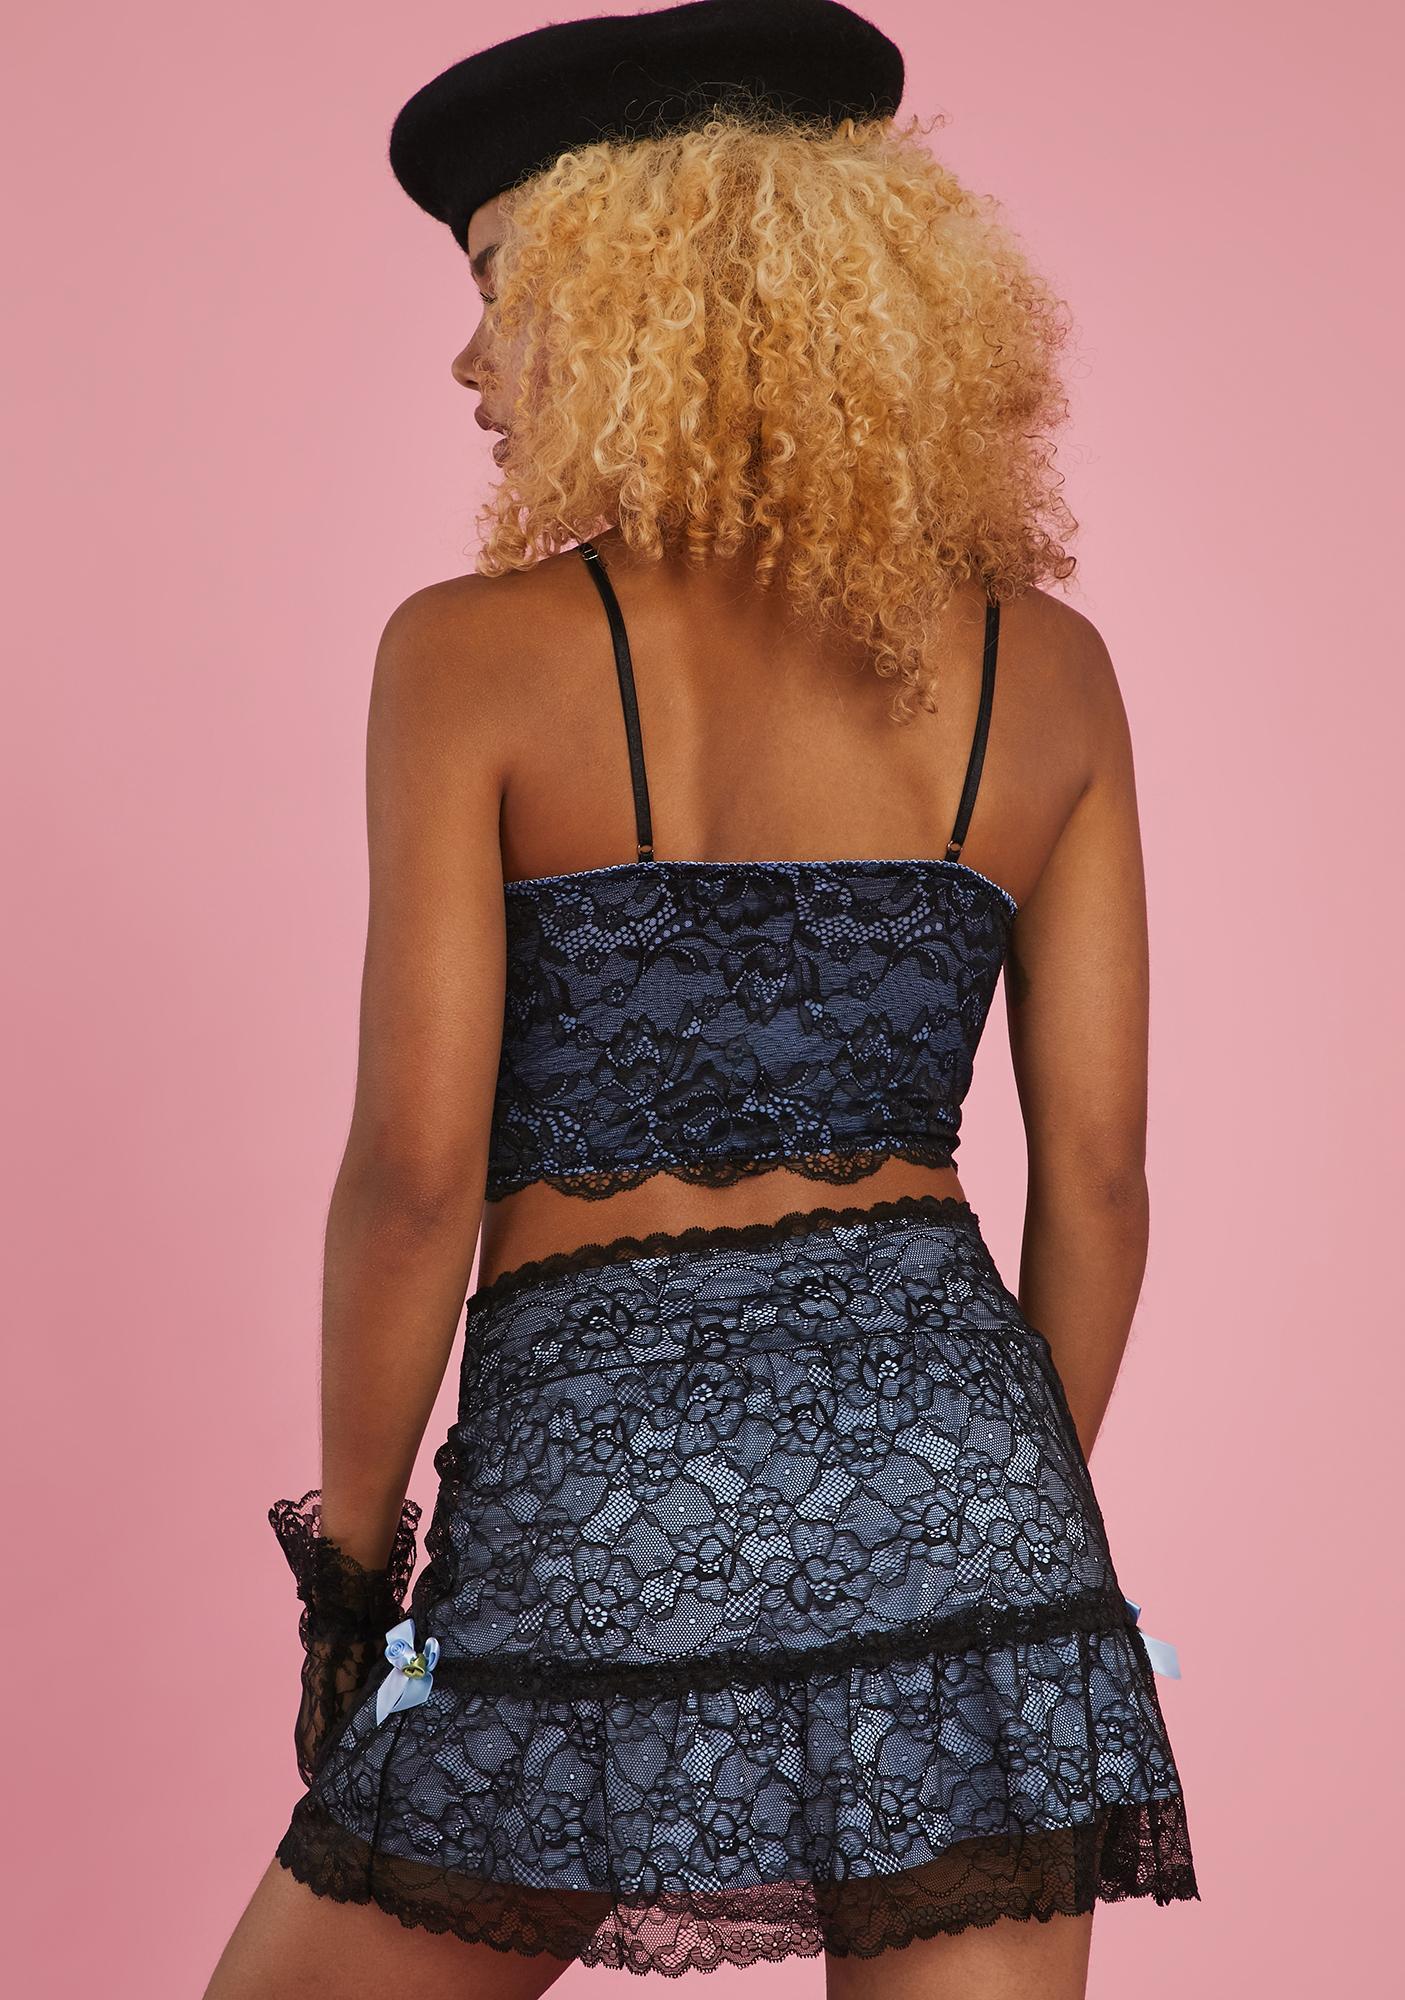 Sugar Thrillz Prim And Proper Mini Skirt